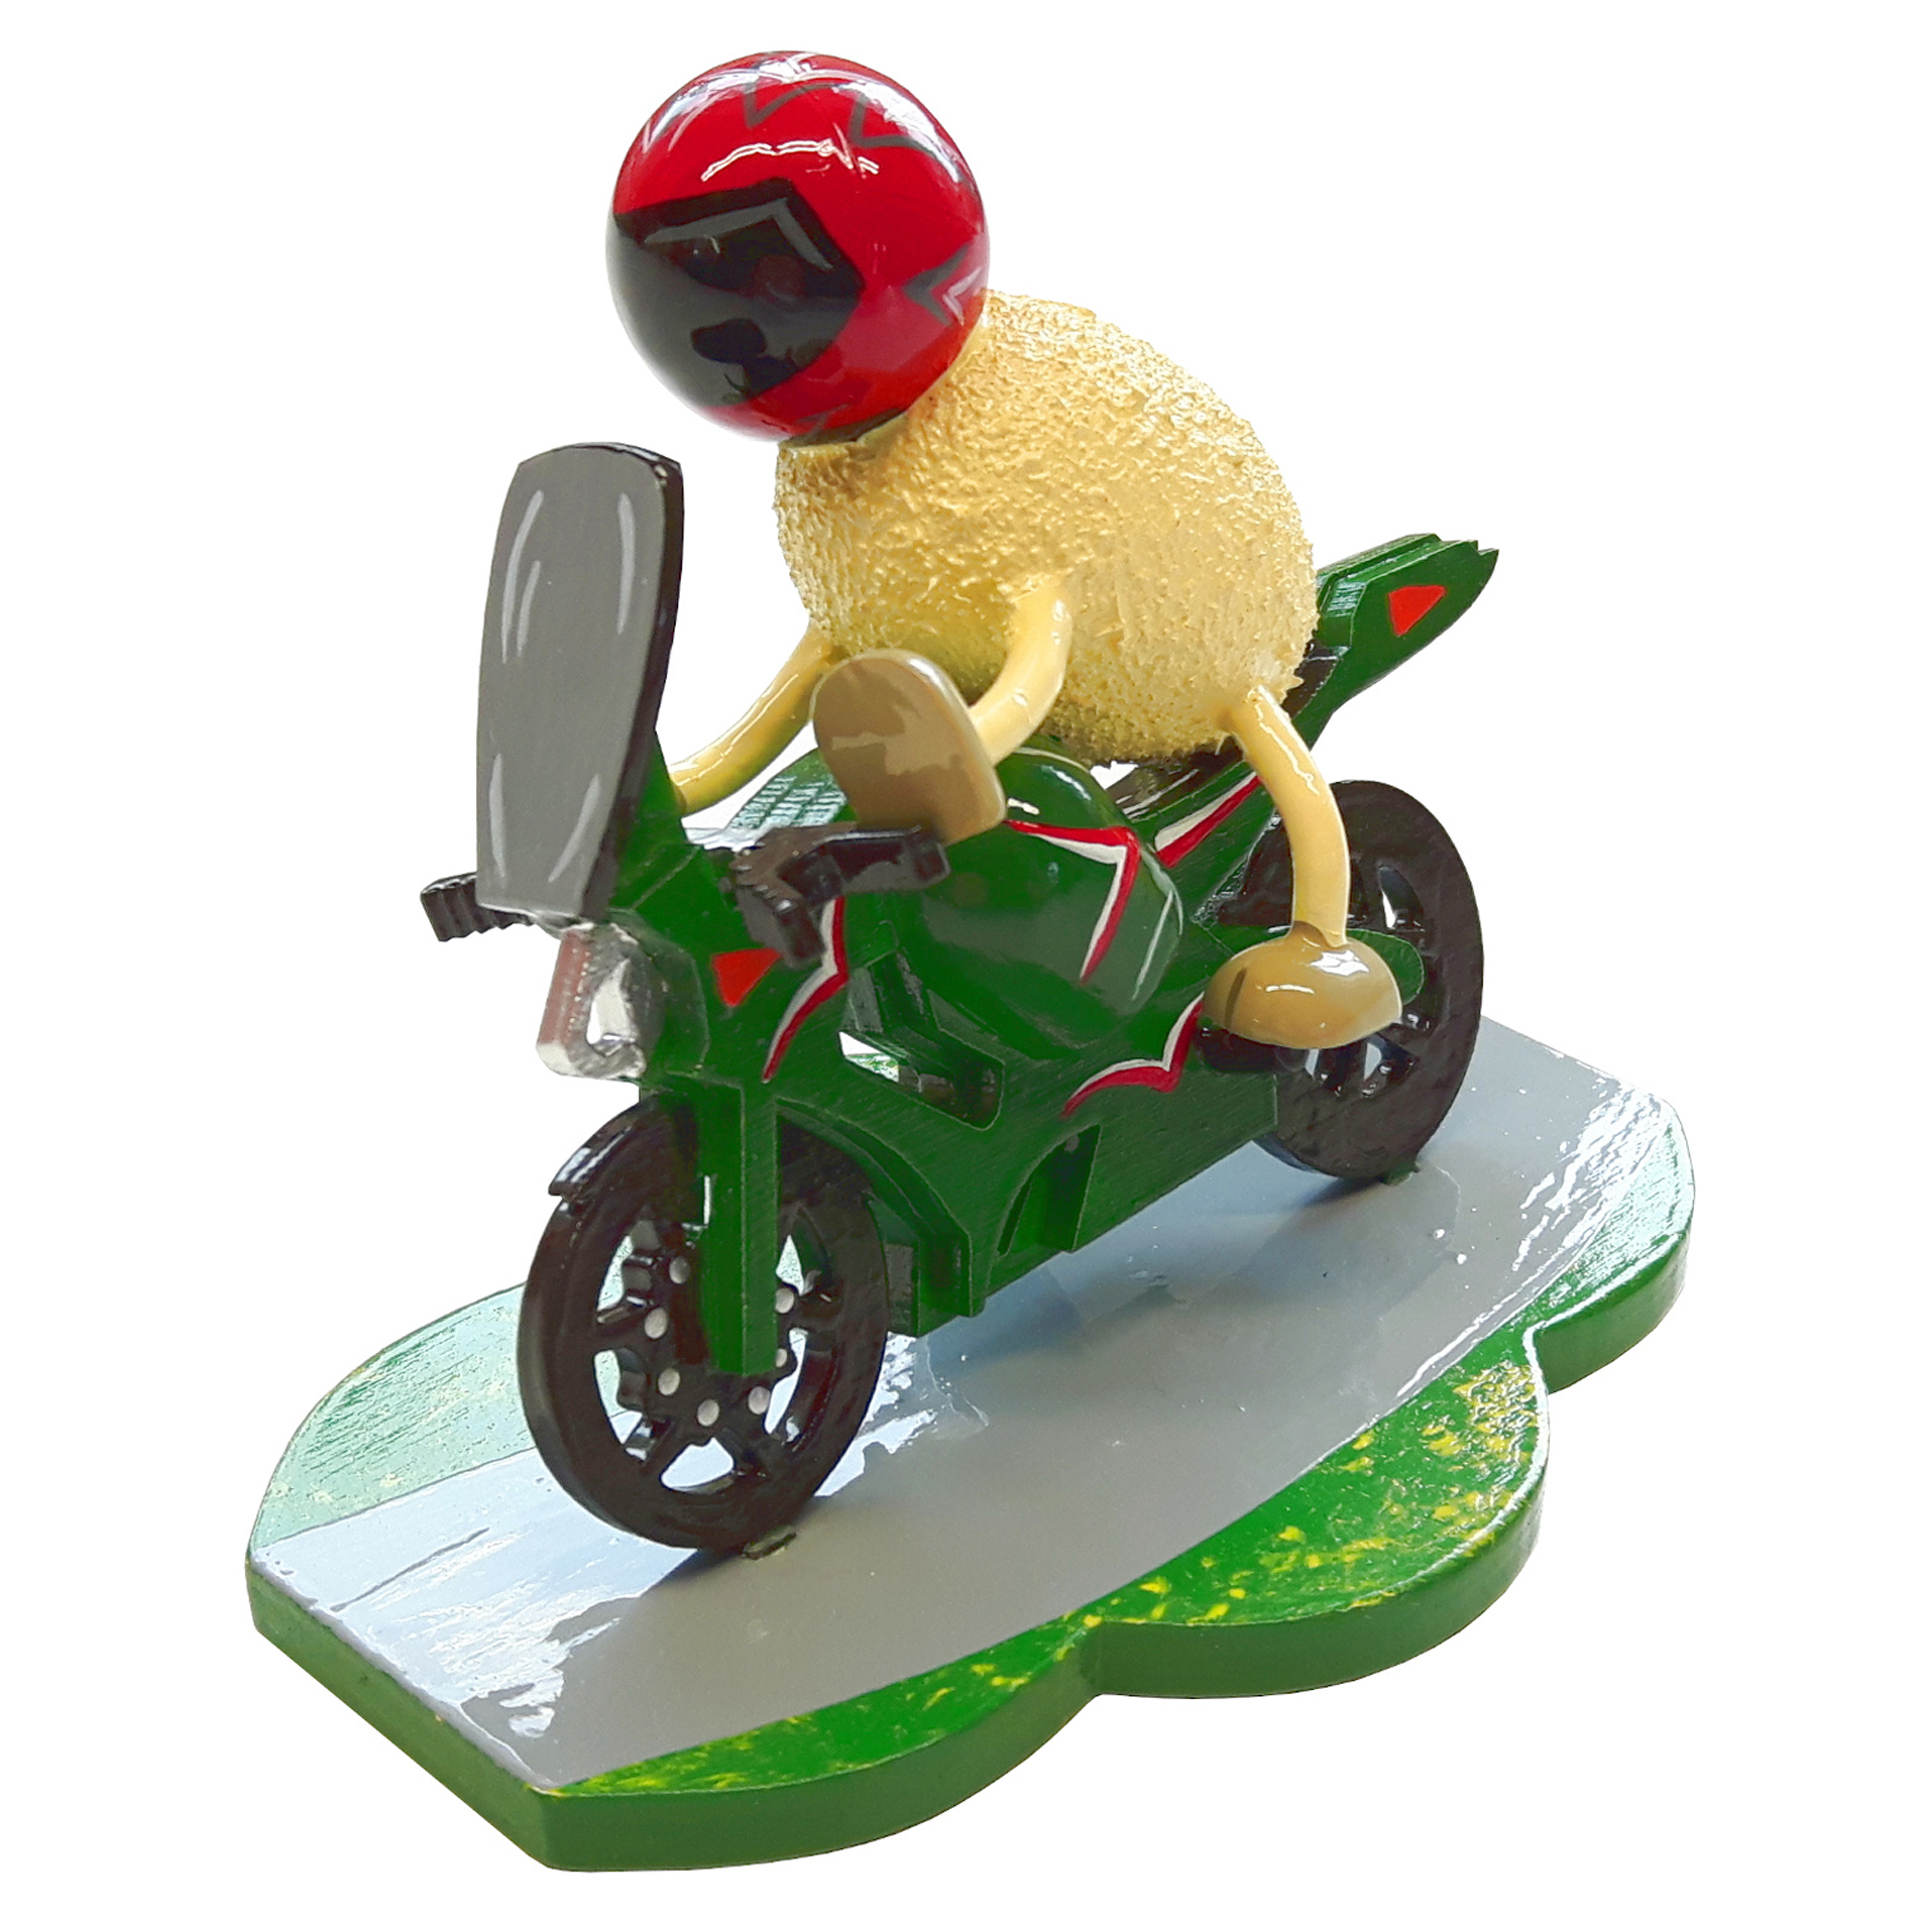 Schaf Racy mit grünem Motorrad